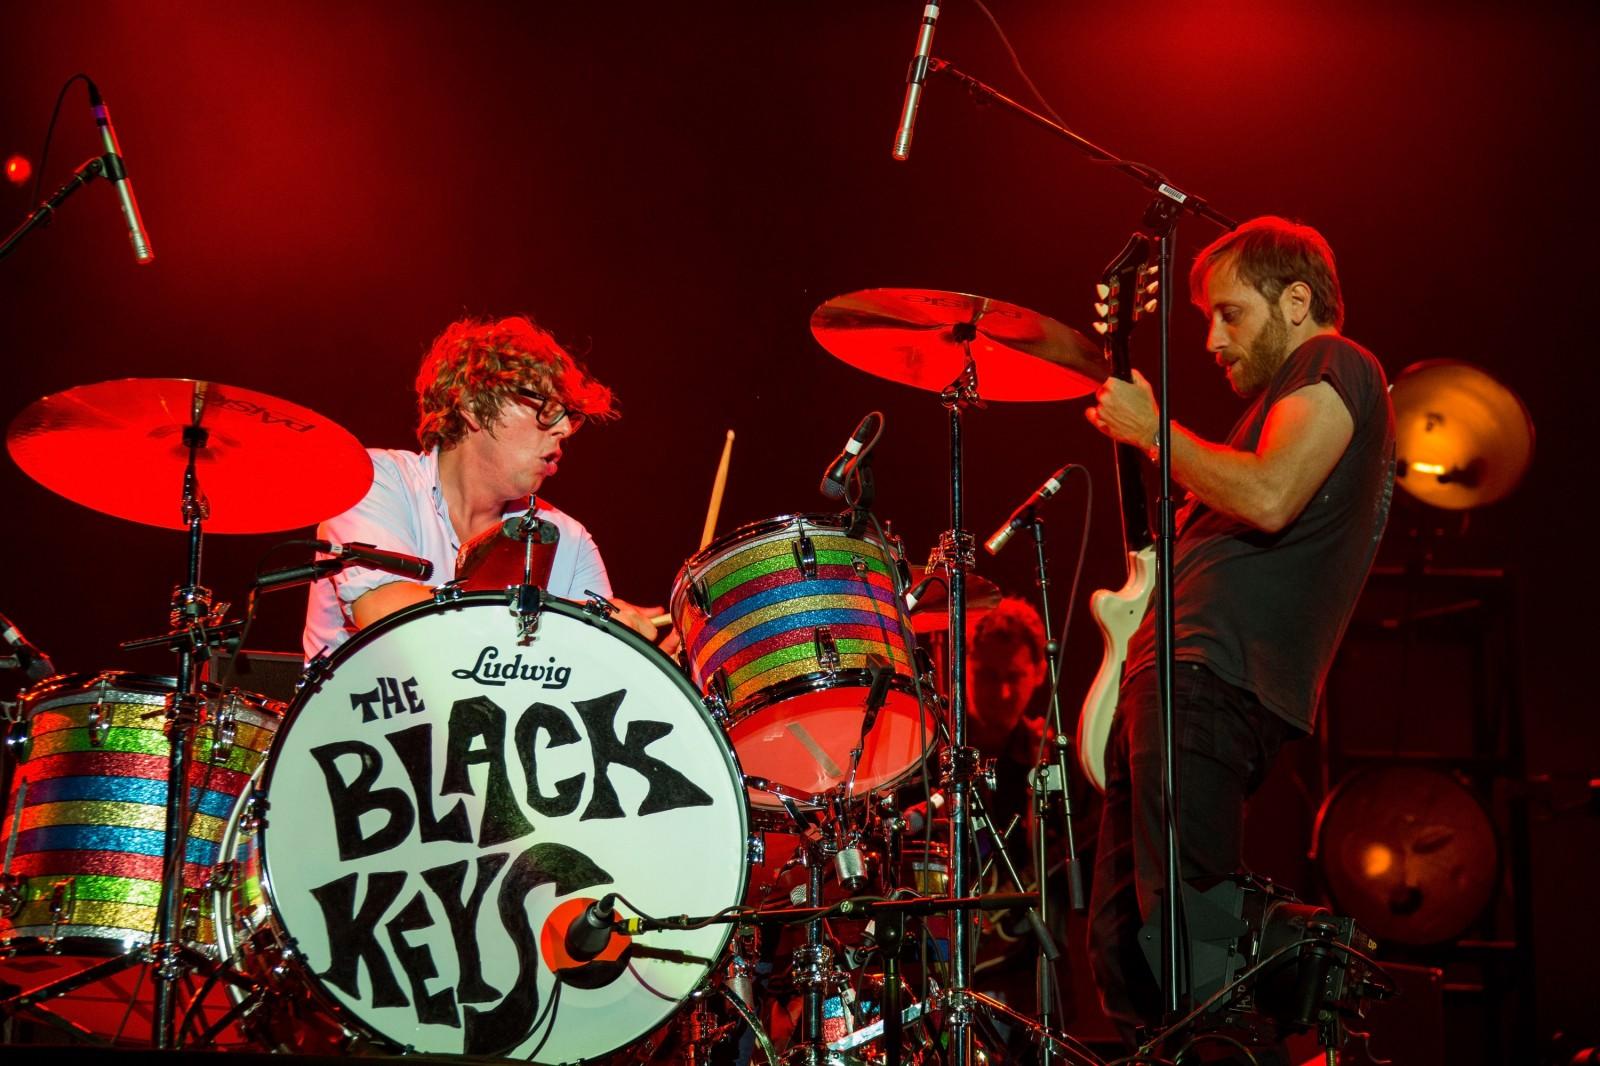 The Black Keys Cancel European Tour